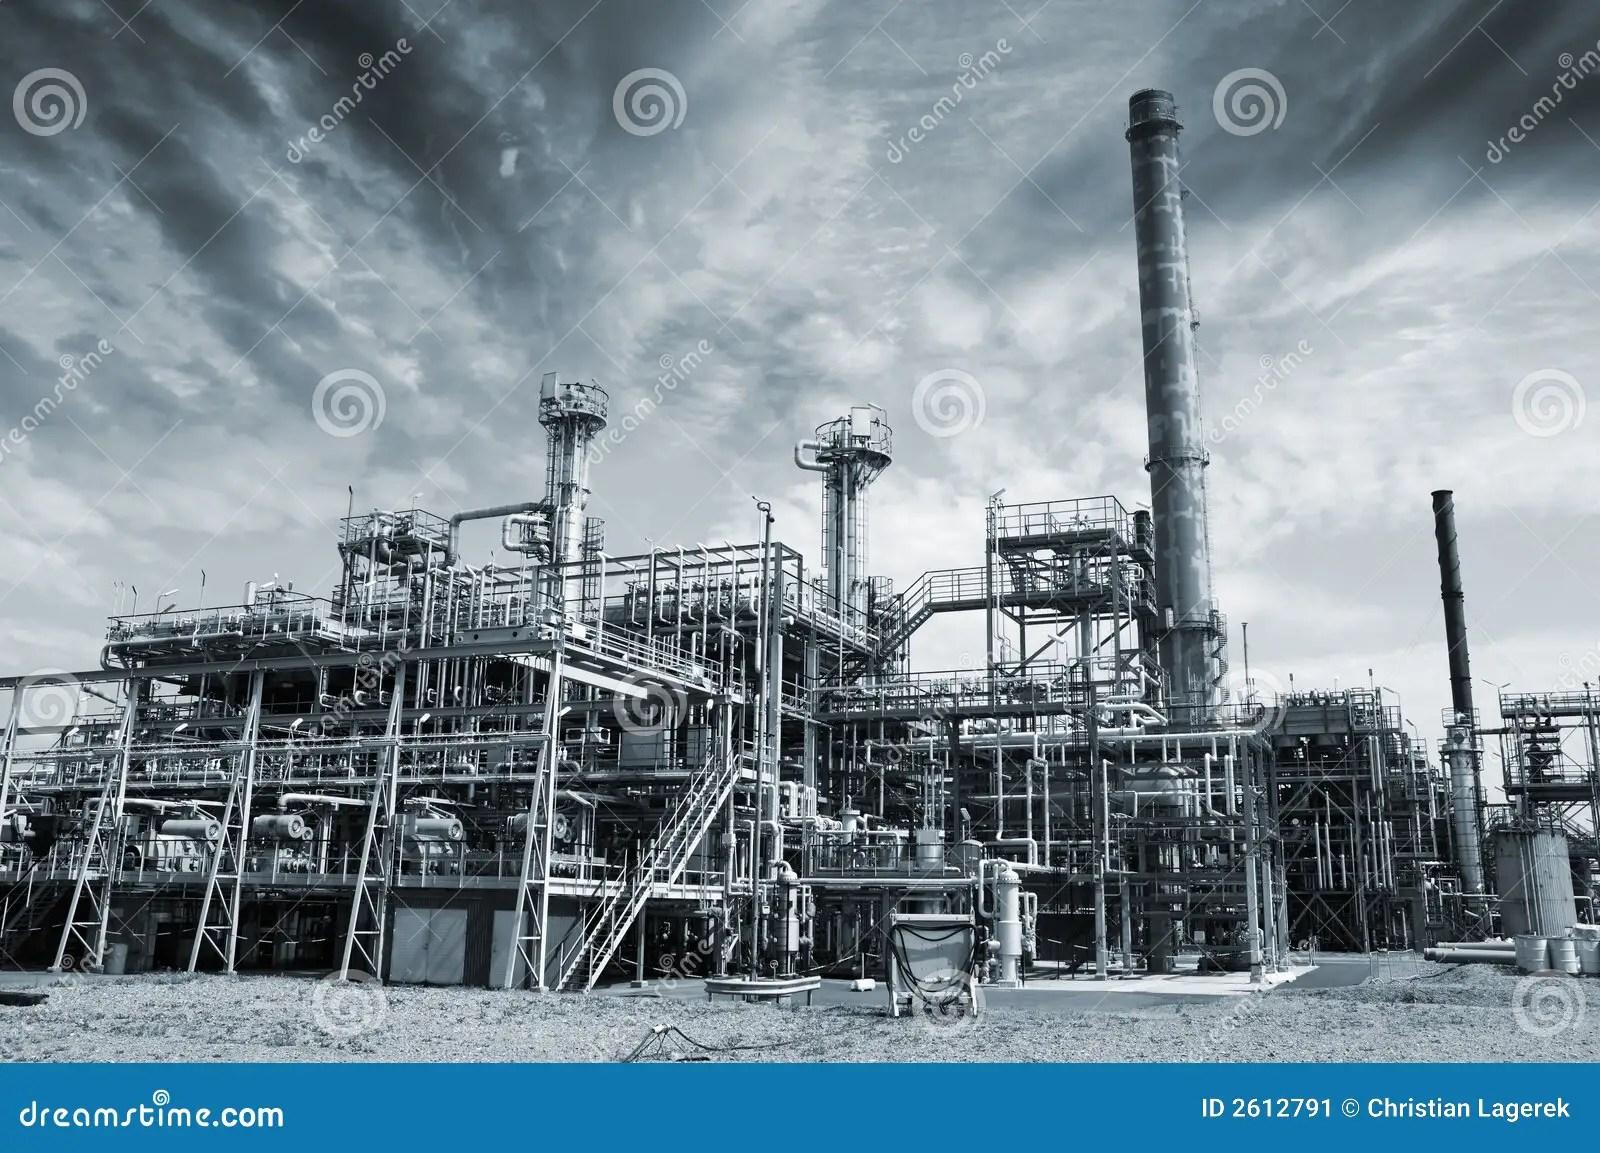 Industrialplants Darker Side Stock Image  Image 2612791